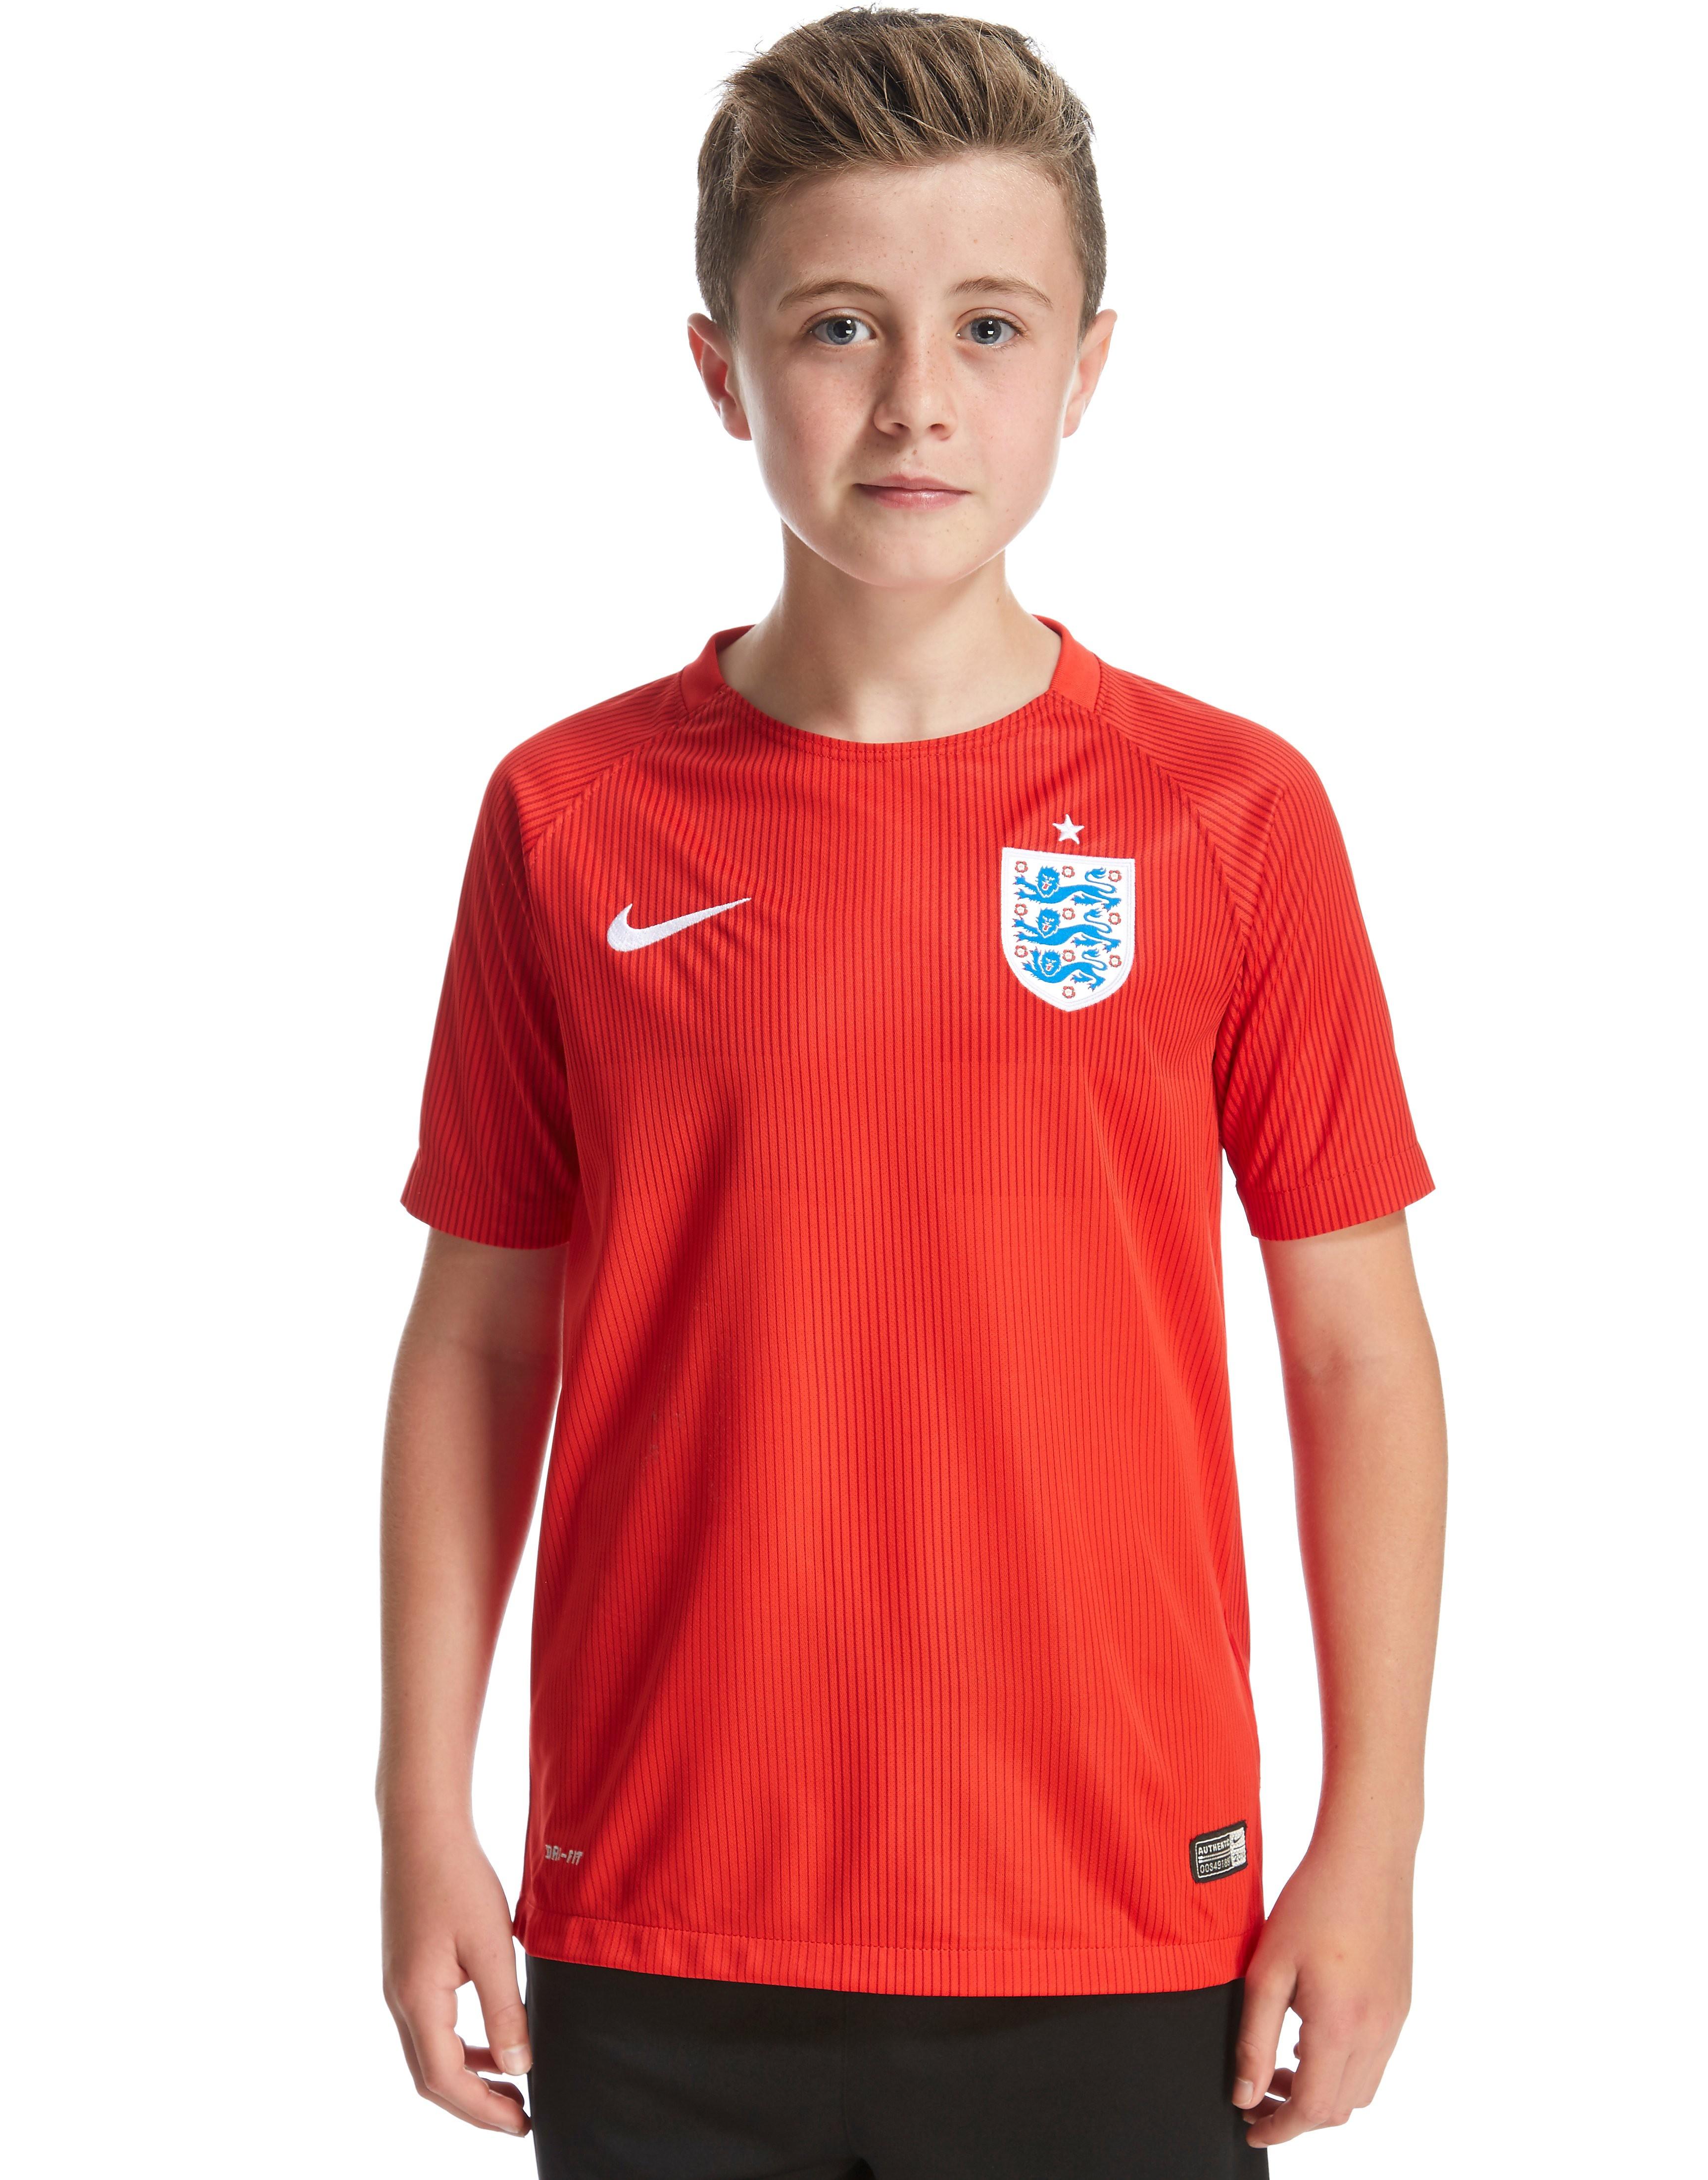 Nike England 2014 Junior Stadium Away Shirt - Red/White - Kids, Red/White